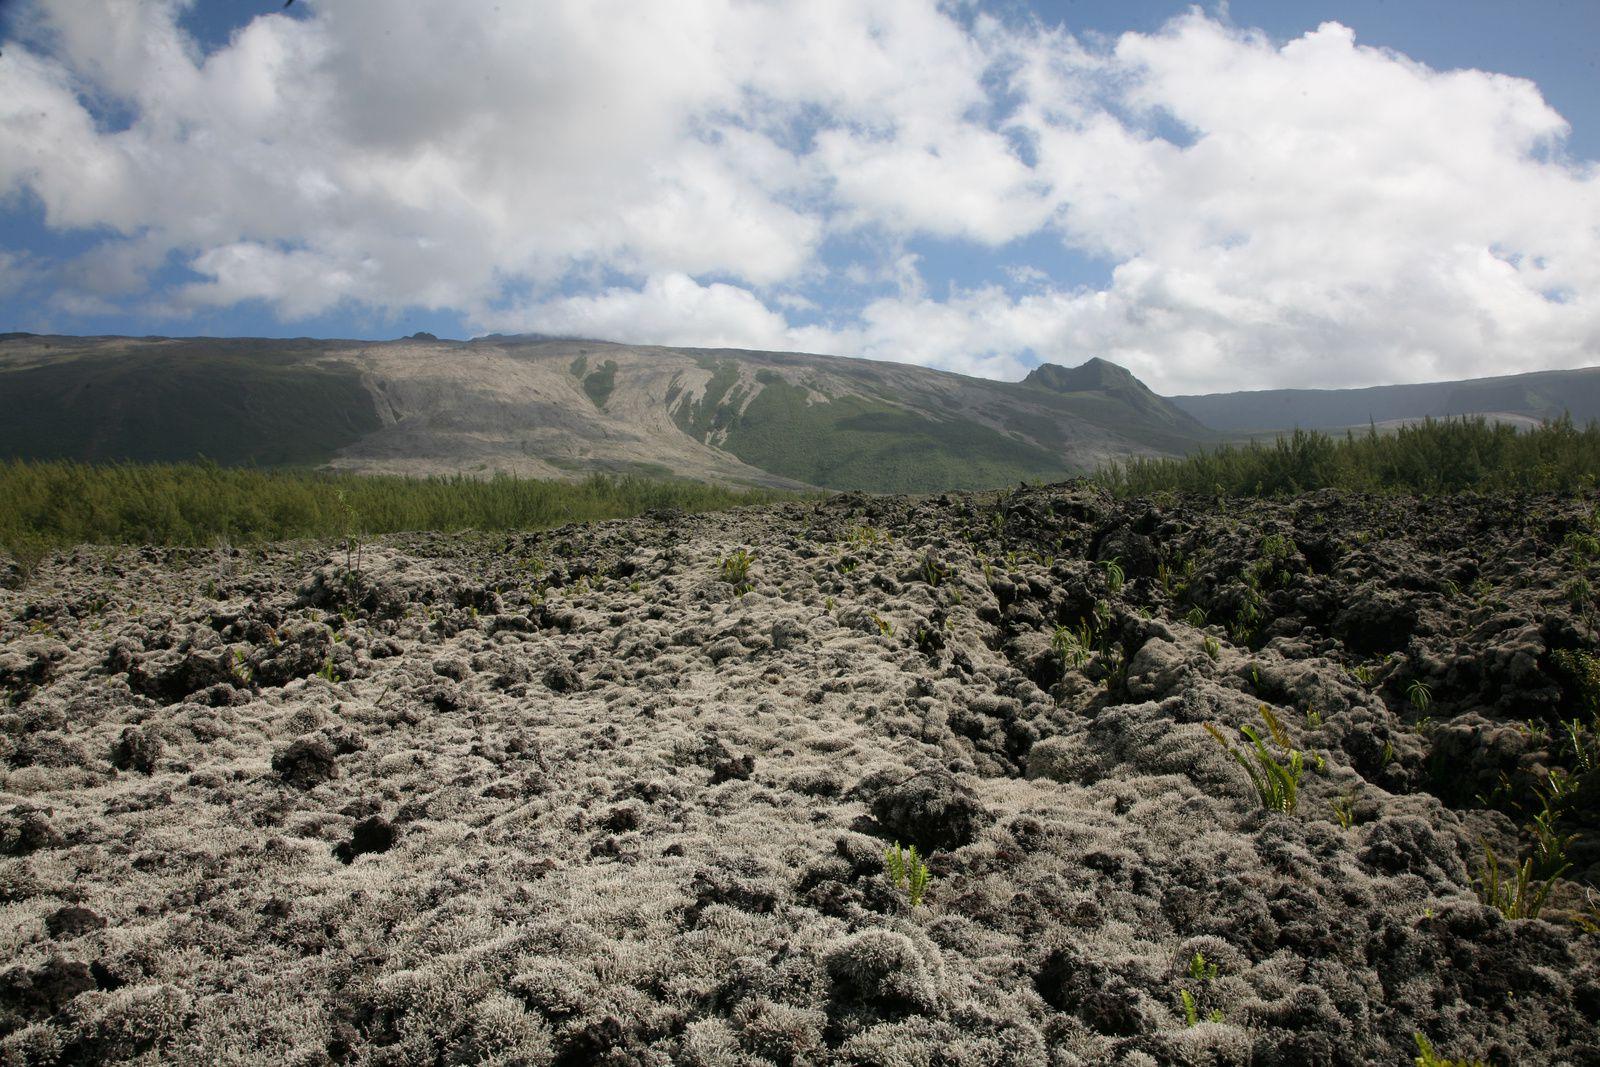 Piton of La Fournaise - Route of the lava / Grand Brûlé -2004 lava flows -photo © Bernard Duyck / June 2017